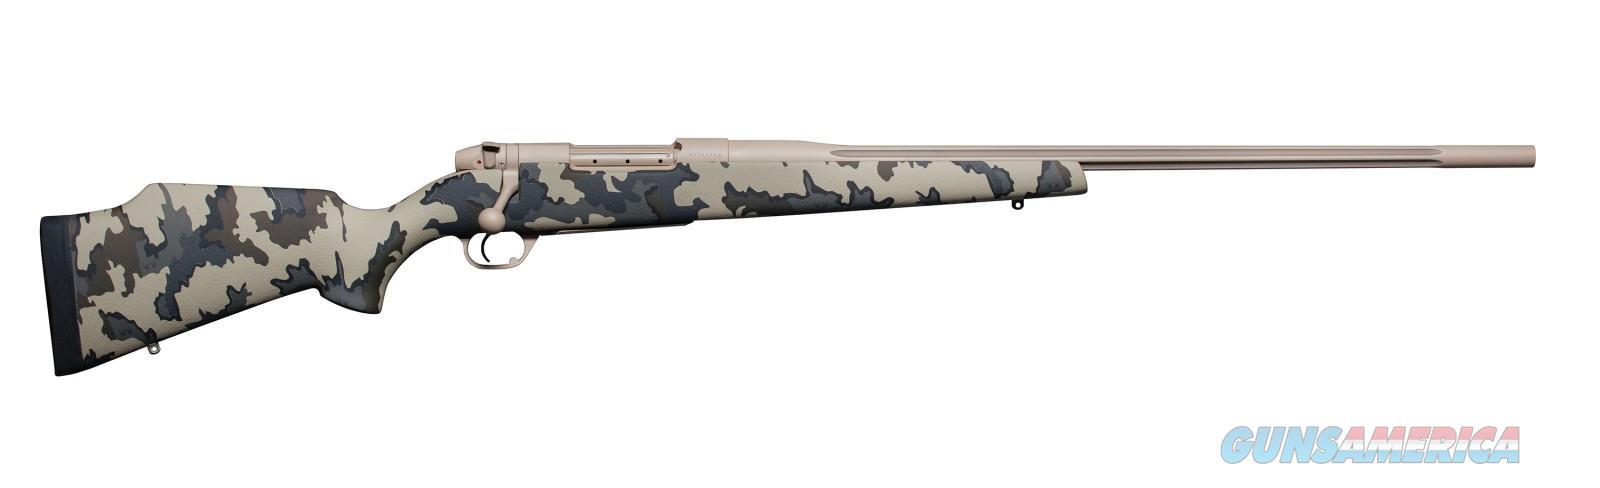 "Weatherby Mark V Arroyo .338 Lapua 28"" MAOM338LR8B  Guns > Rifles > Weatherby Rifles > Sporting"